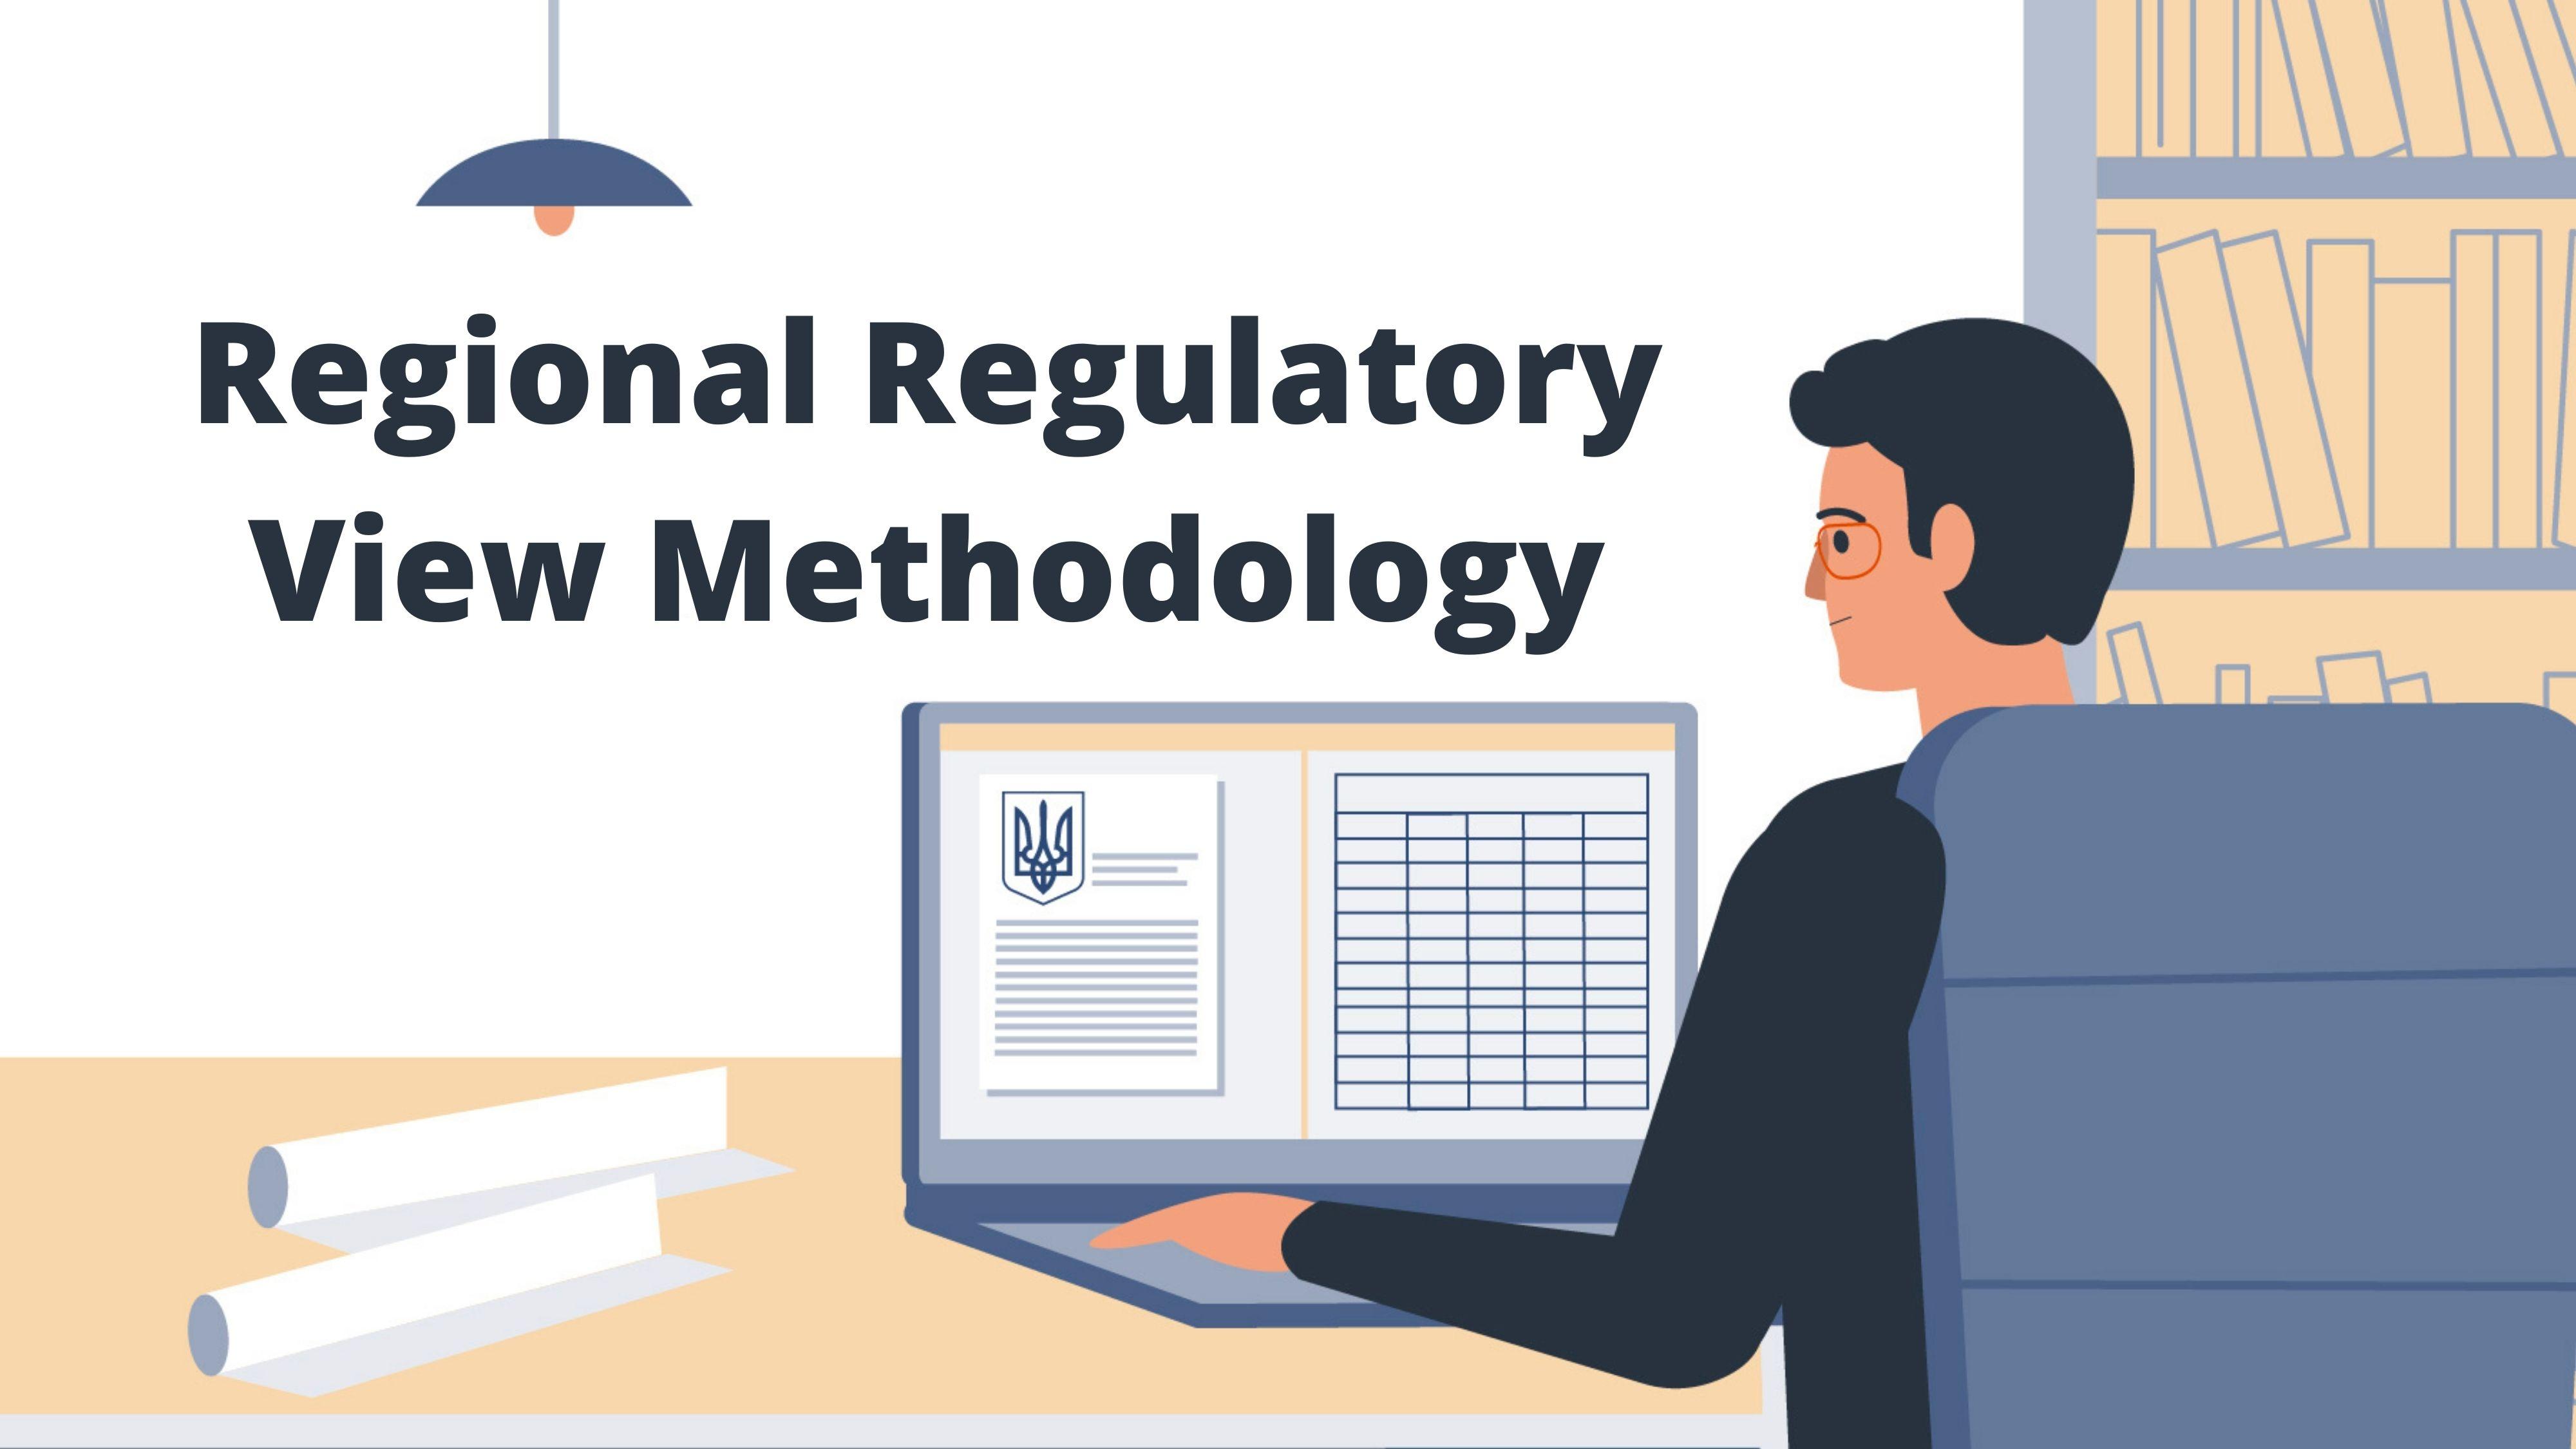 Regional Regulatory View Methodology - Animated Video